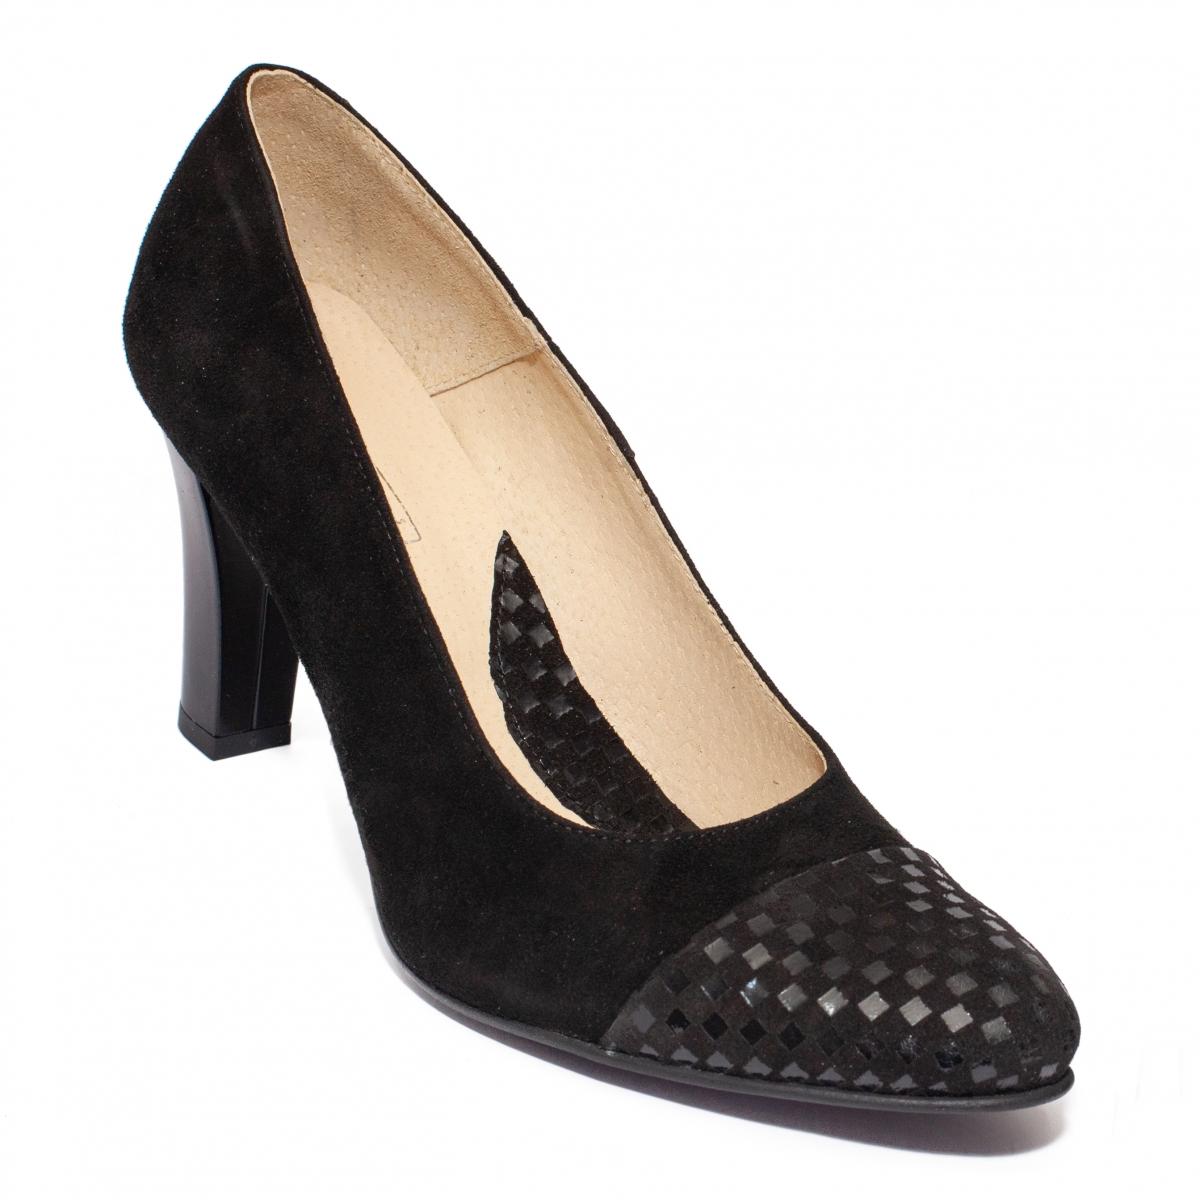 Pantofi cu toc dama 952 negru sah negru 33-40